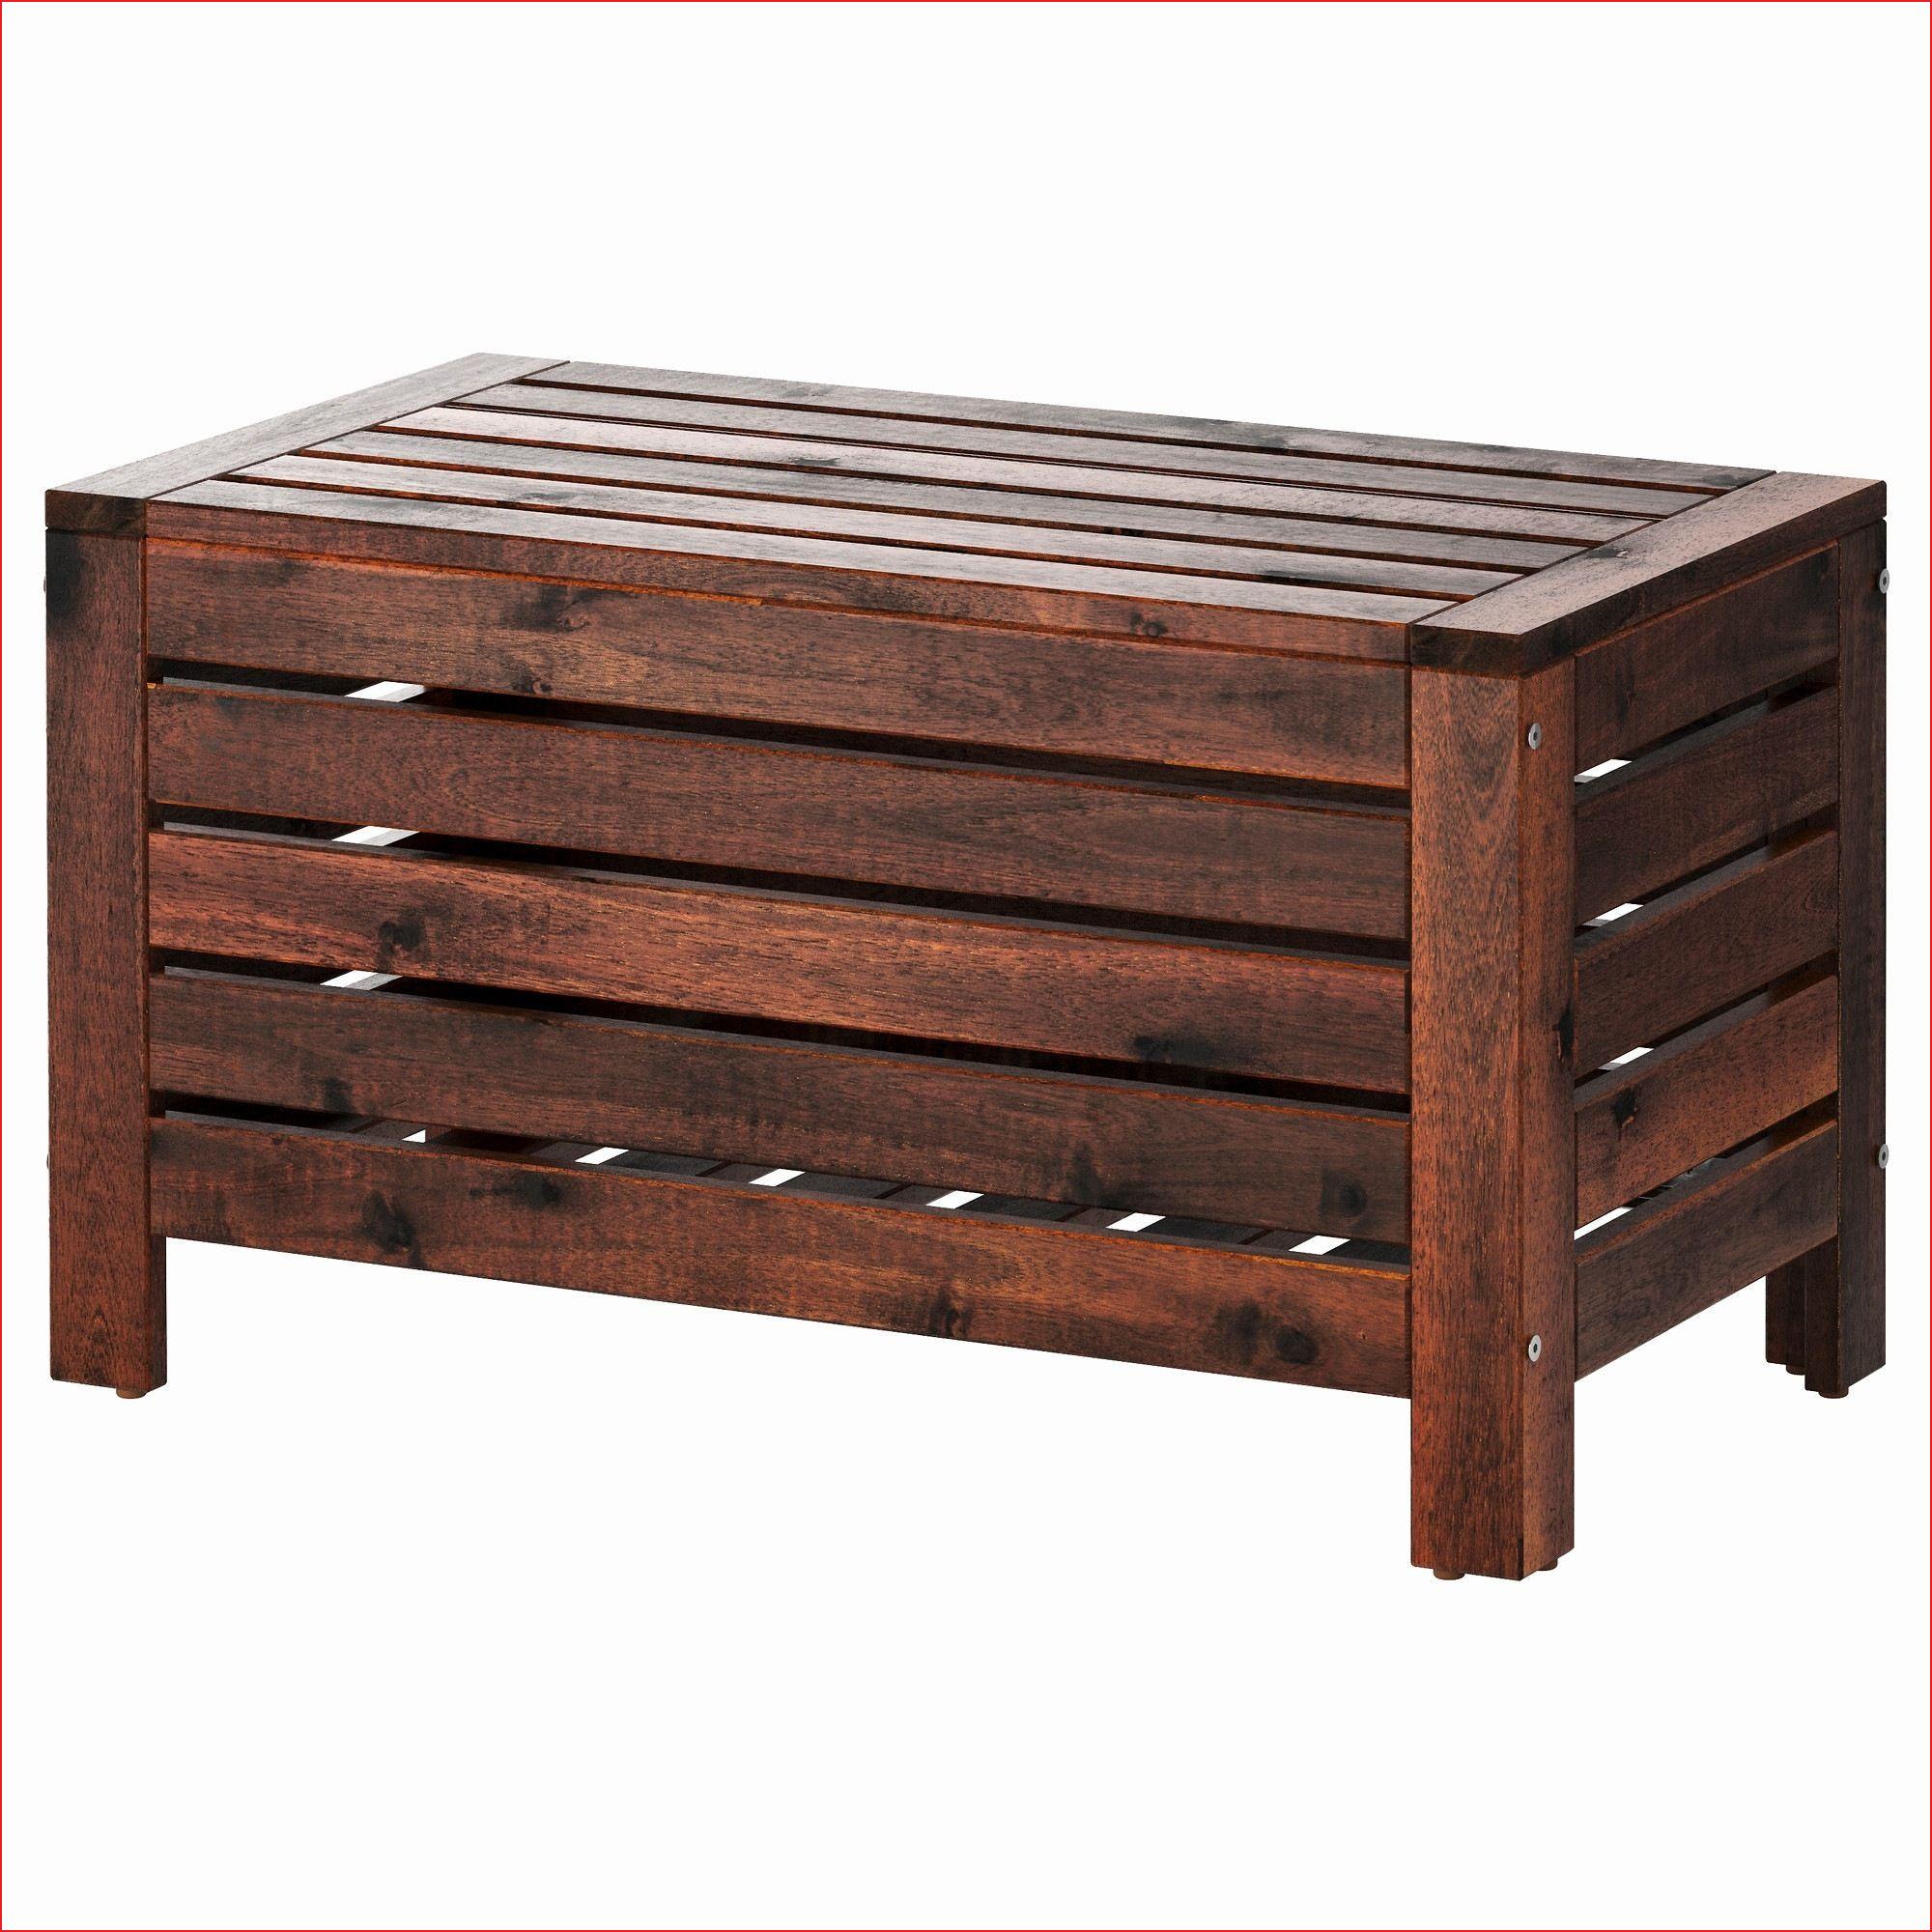 Prendre Un Coffre De Jardin Ikea Collection De Jardin Idée ... à Coffre De Jardin Ikea